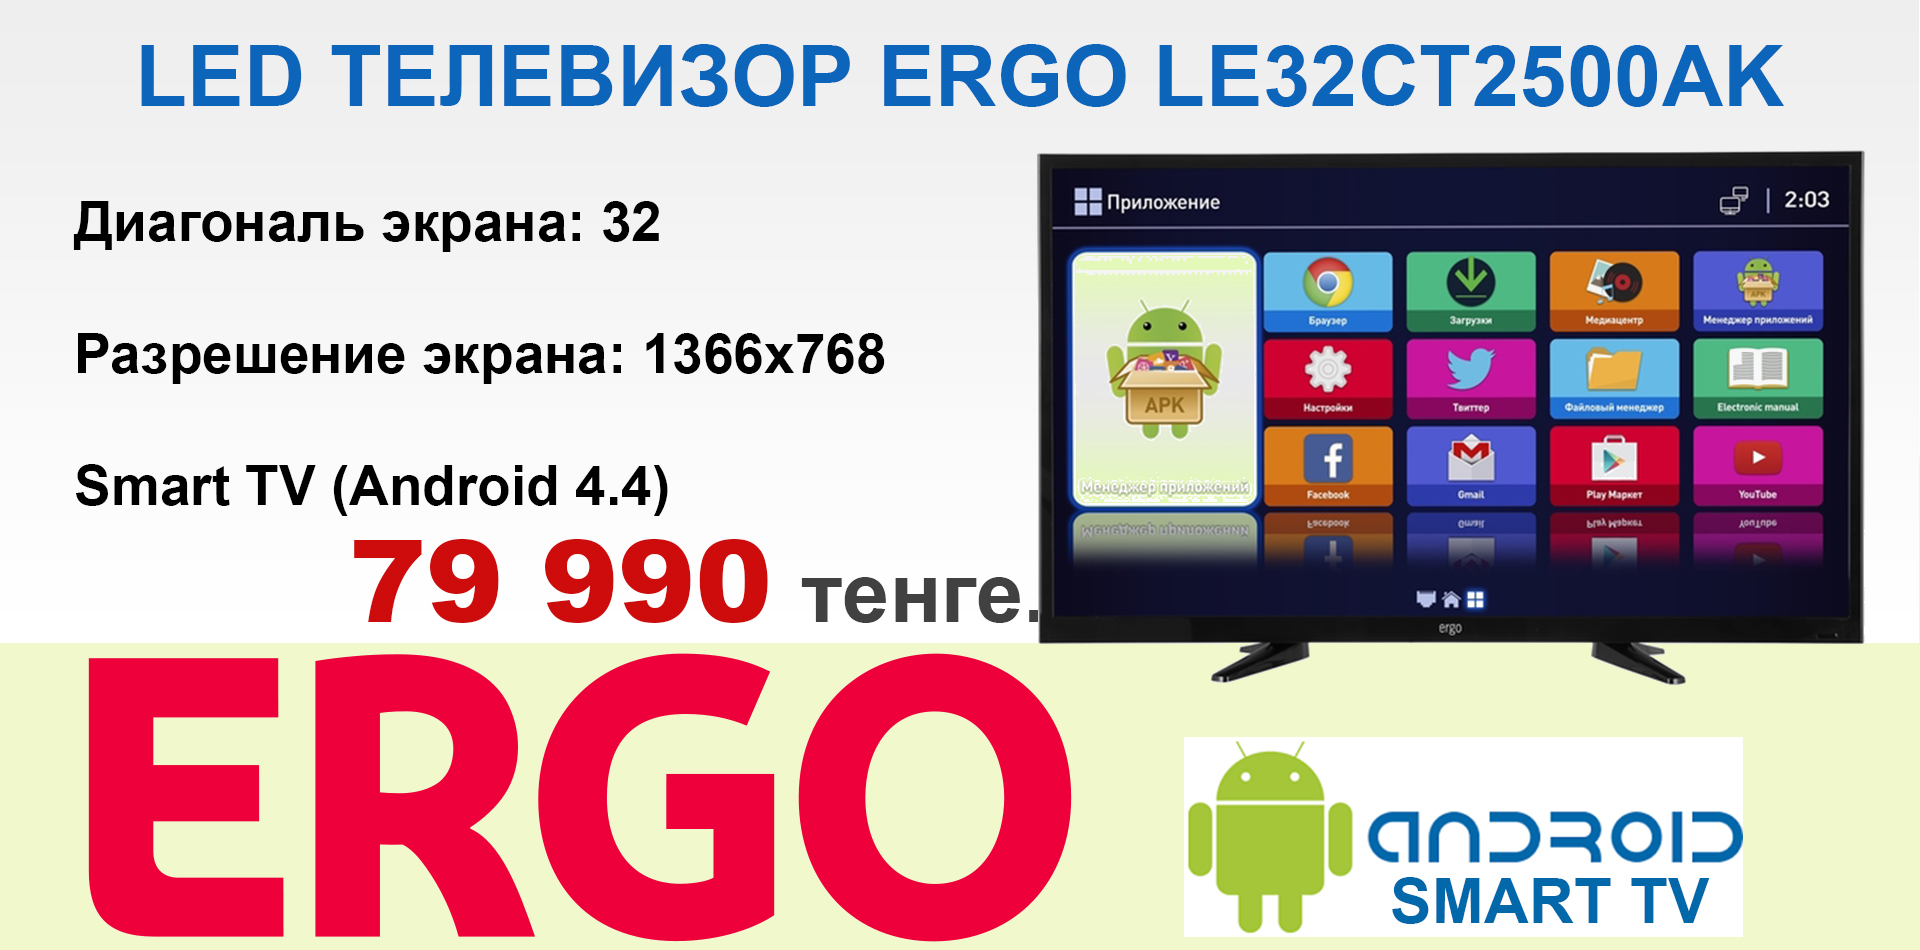 ТЕЛЕВИЗОР ERGO LE32CT2500AK